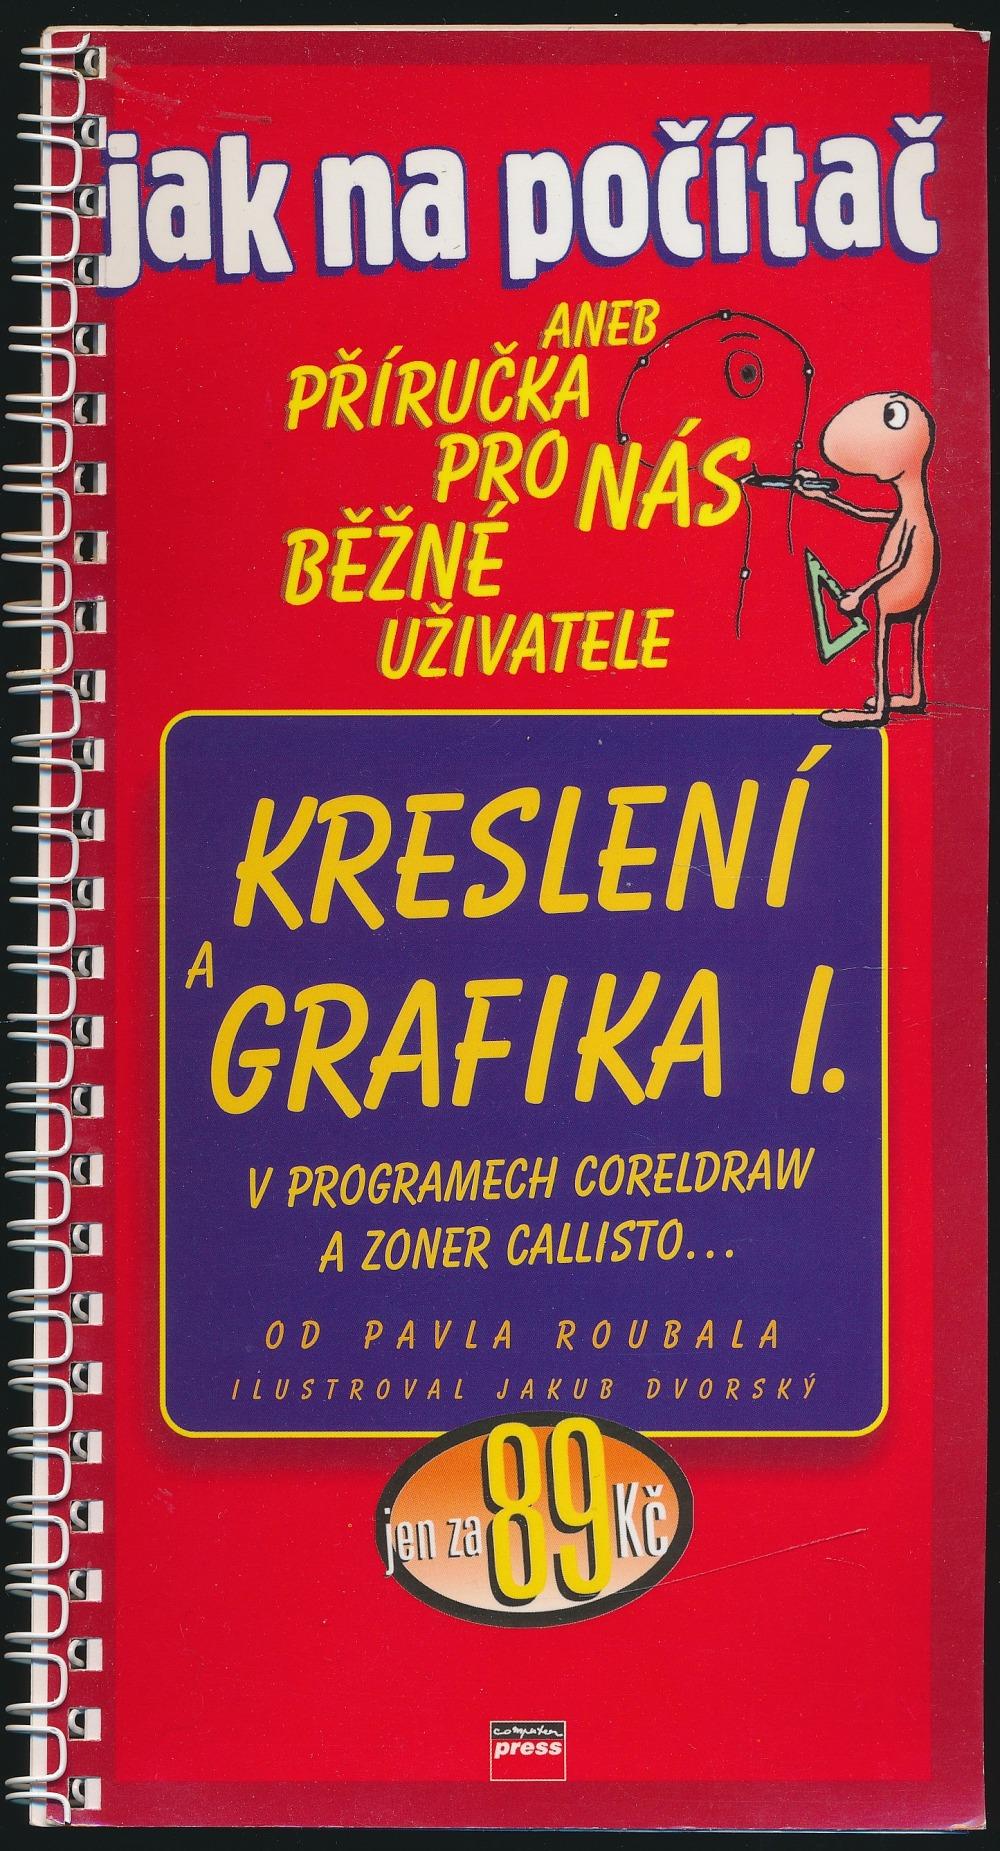 Kresleni A Grafika I Pavel Roubal Databaze Knih